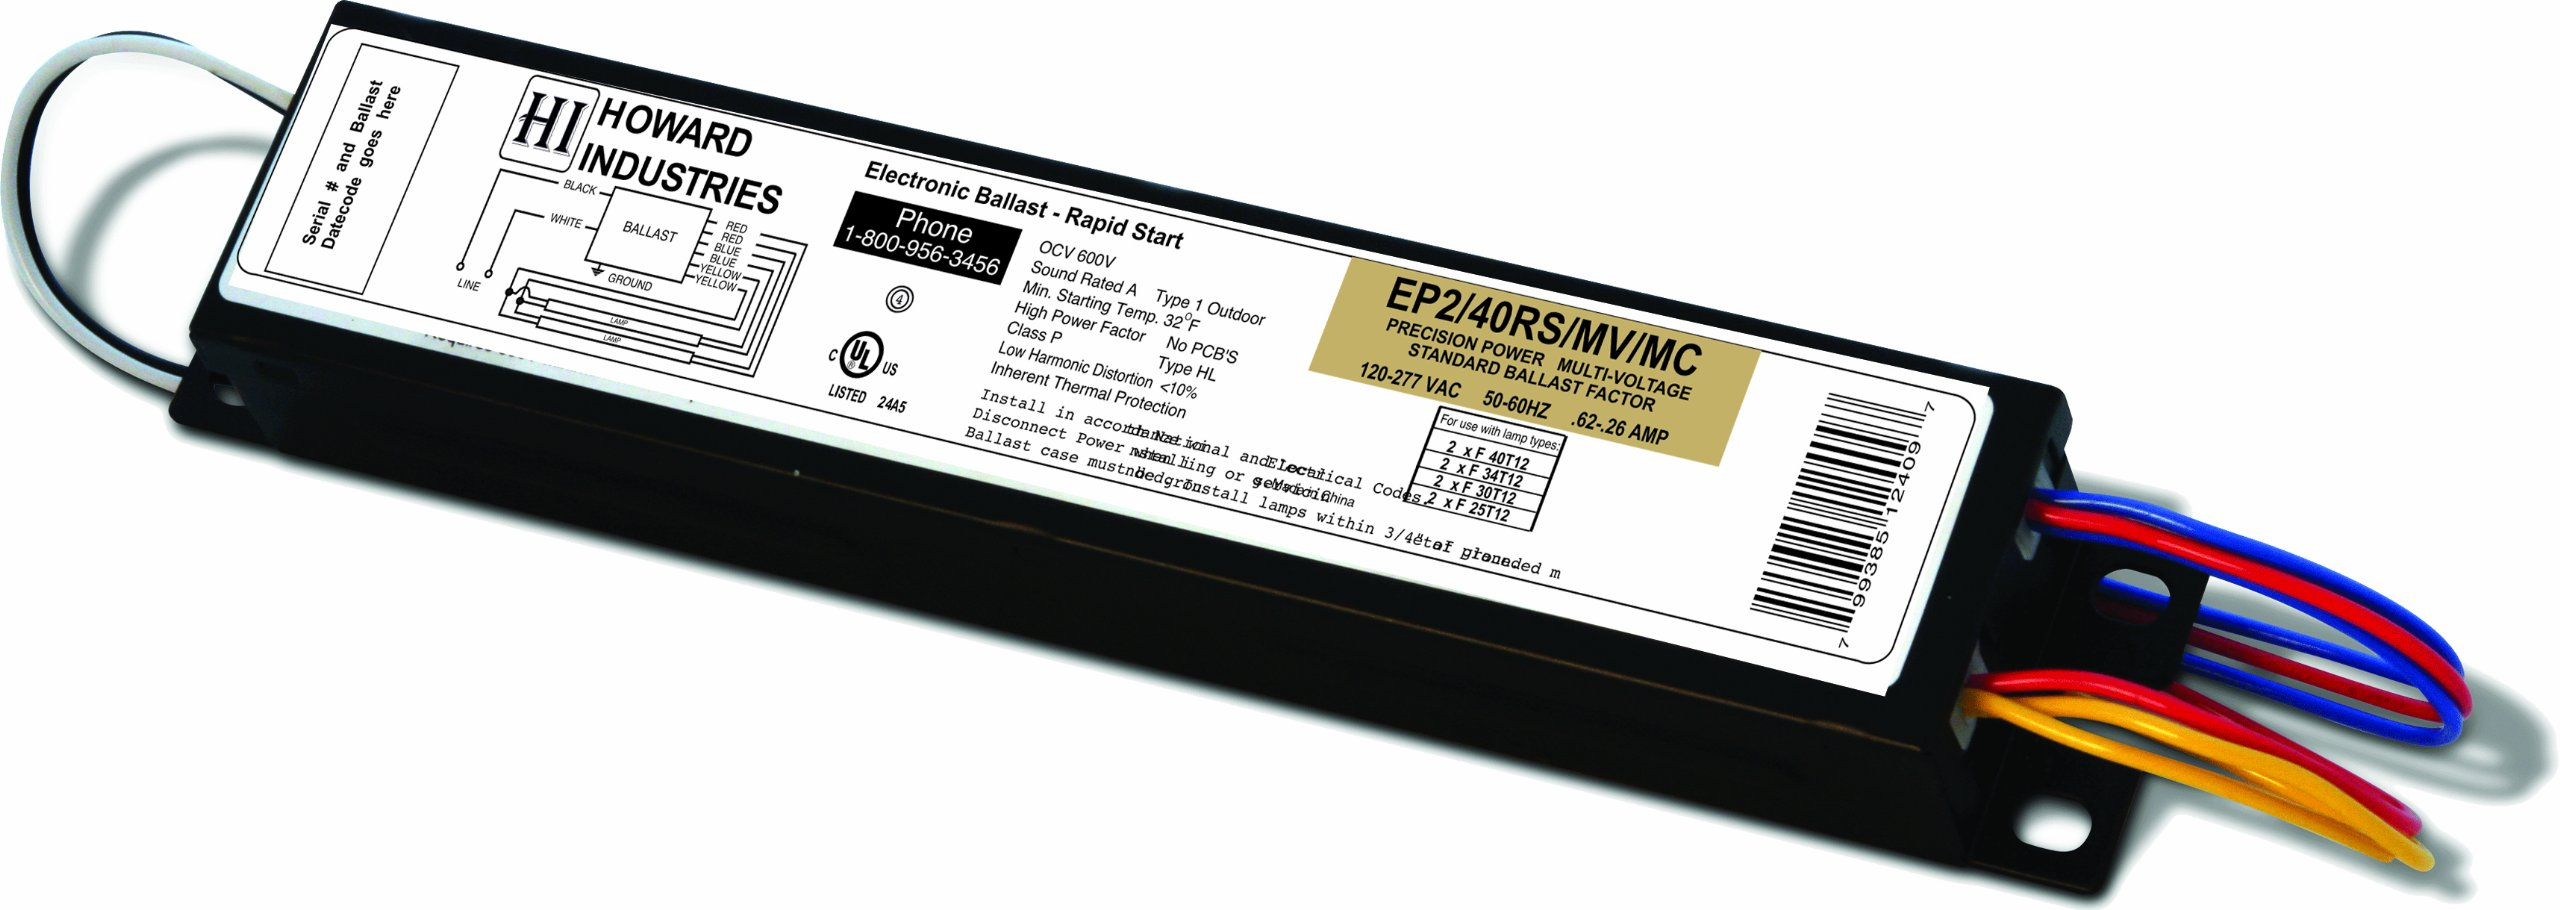 Howard Lighting EP2/40RS/MV/MC Electronic Ballast for Operating  F40T12 Lamps by Howard Lighting